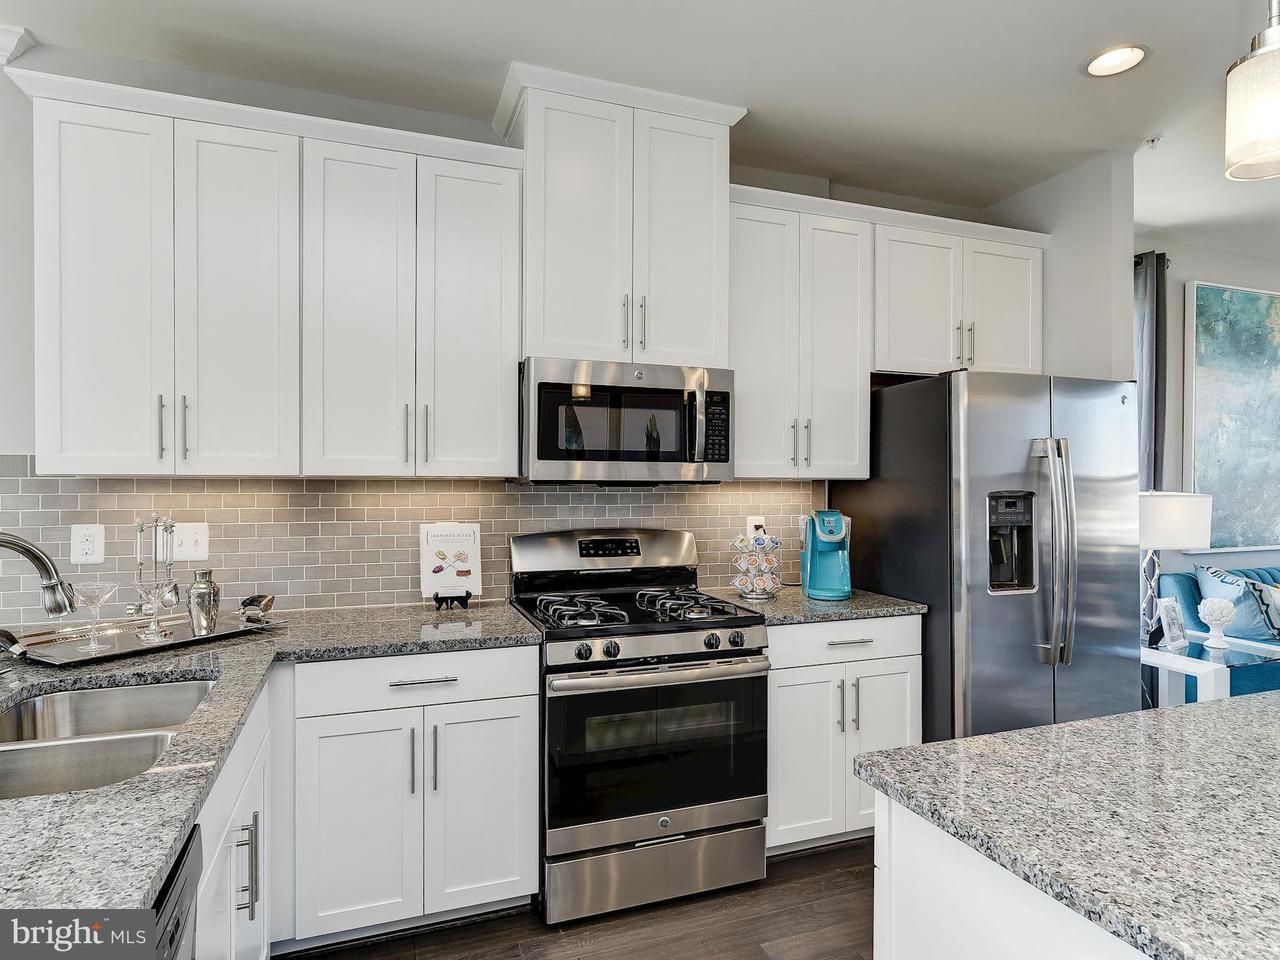 Additional photo for property listing at 3619 JAMISON ST NE 3619 JAMISON ST NE 华盛顿市, 哥伦比亚特区 20018 美国